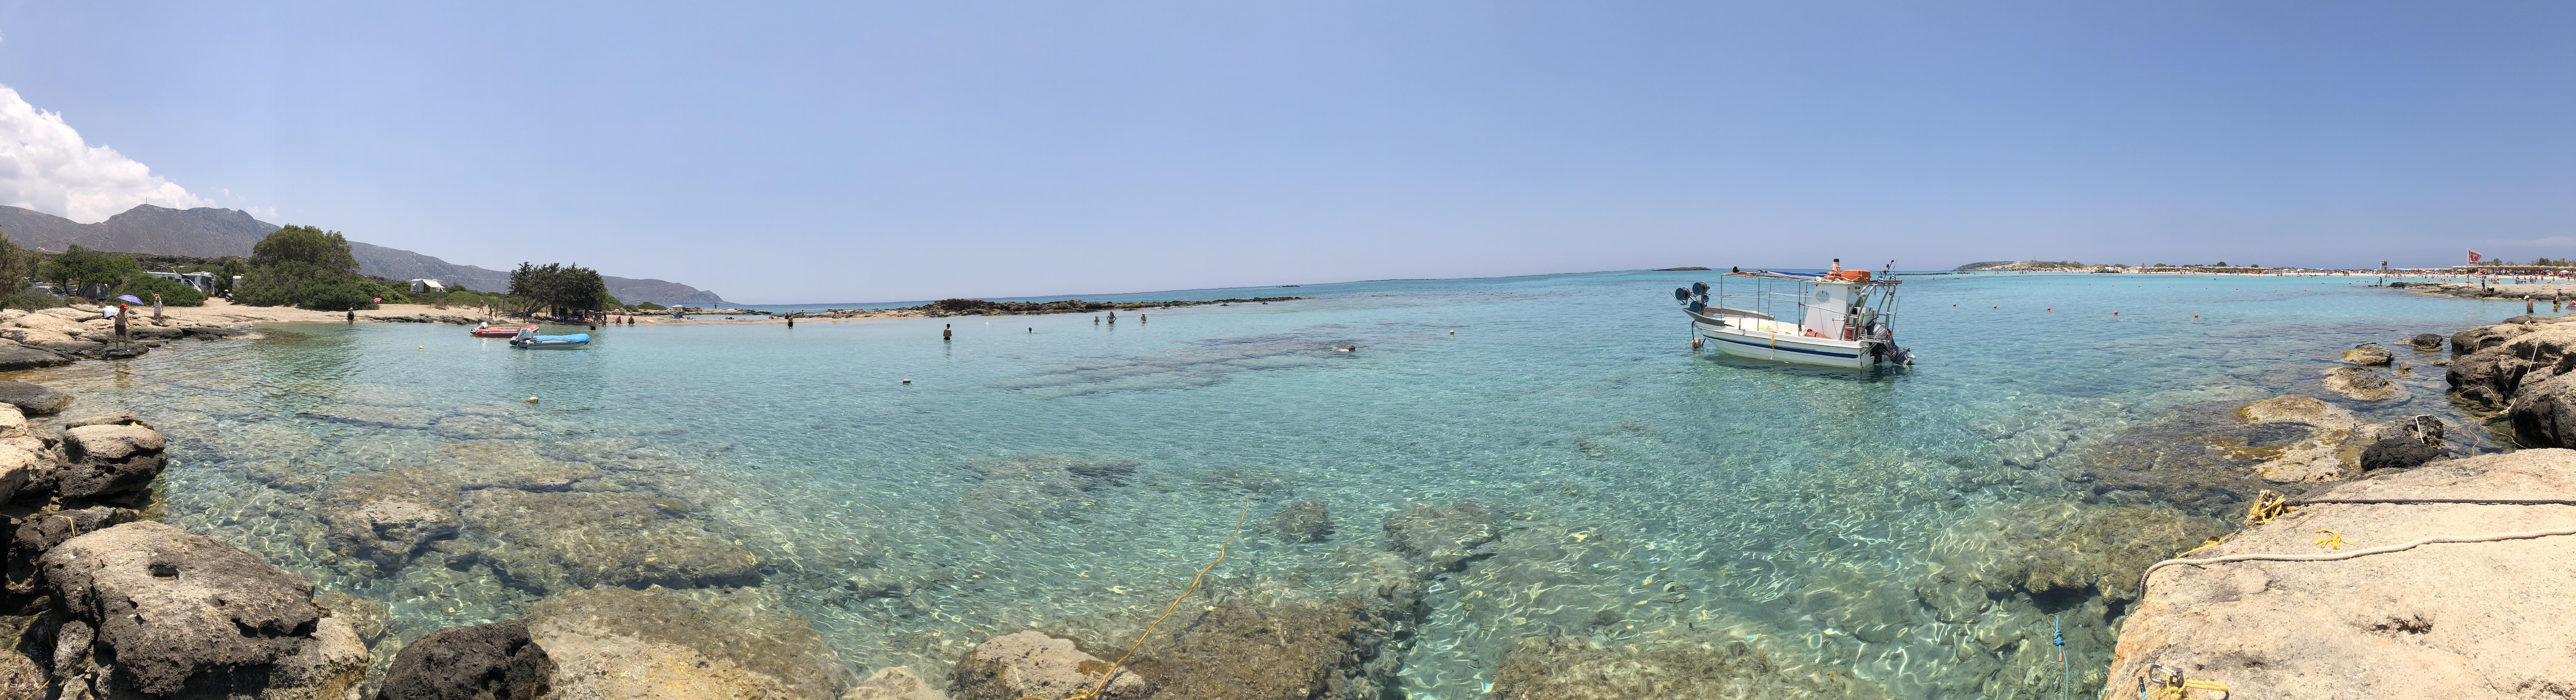 Elafonisssi Beach with Kids